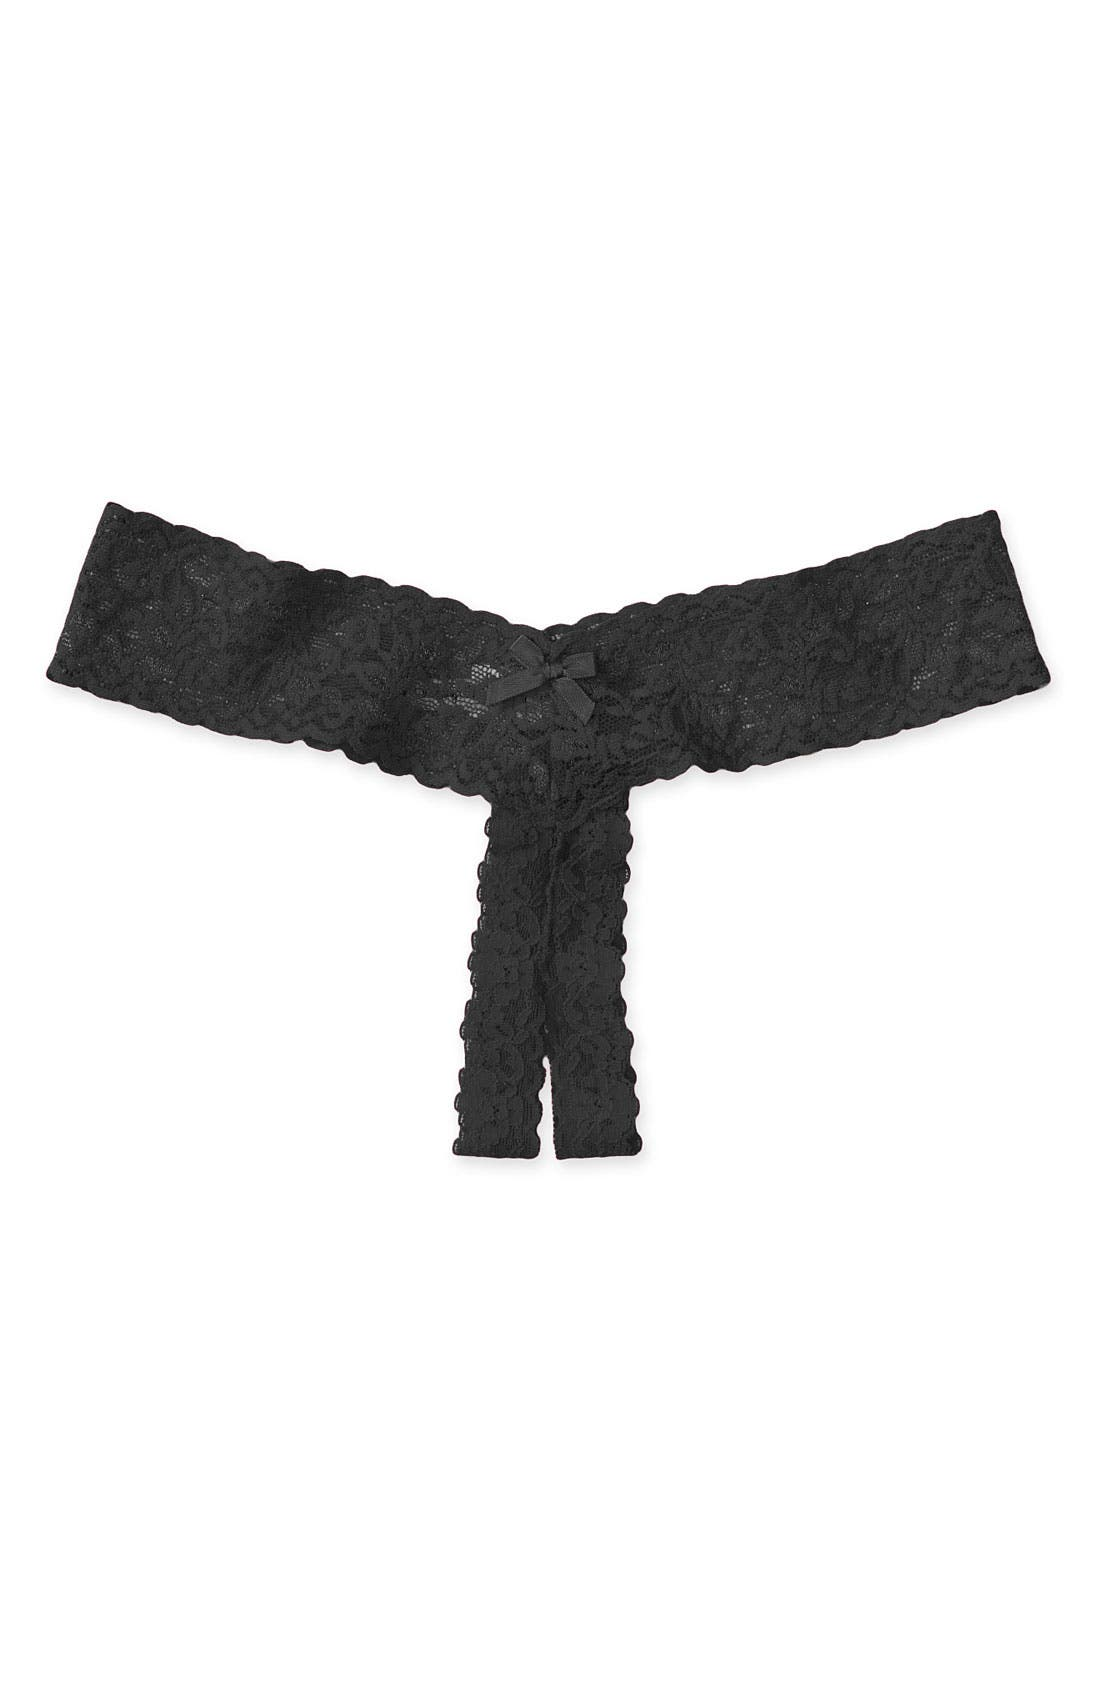 HANKY PANKY Signature Lace Low Rise Thong, Main, color, BLACK